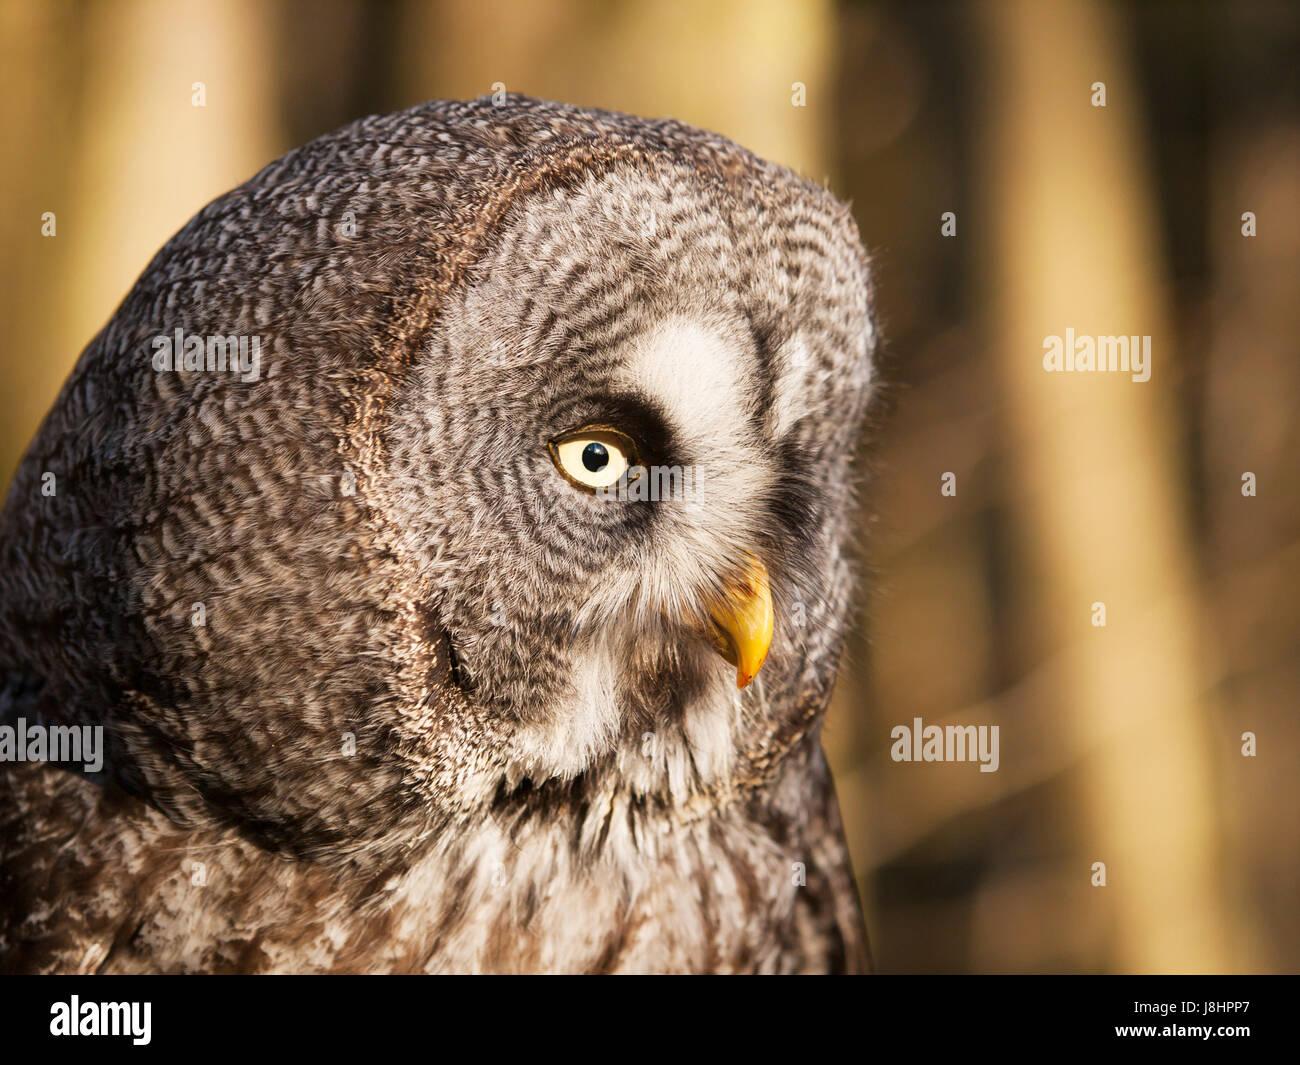 Detail of head of geat grey owl - Strix nebulosa - Stock Image